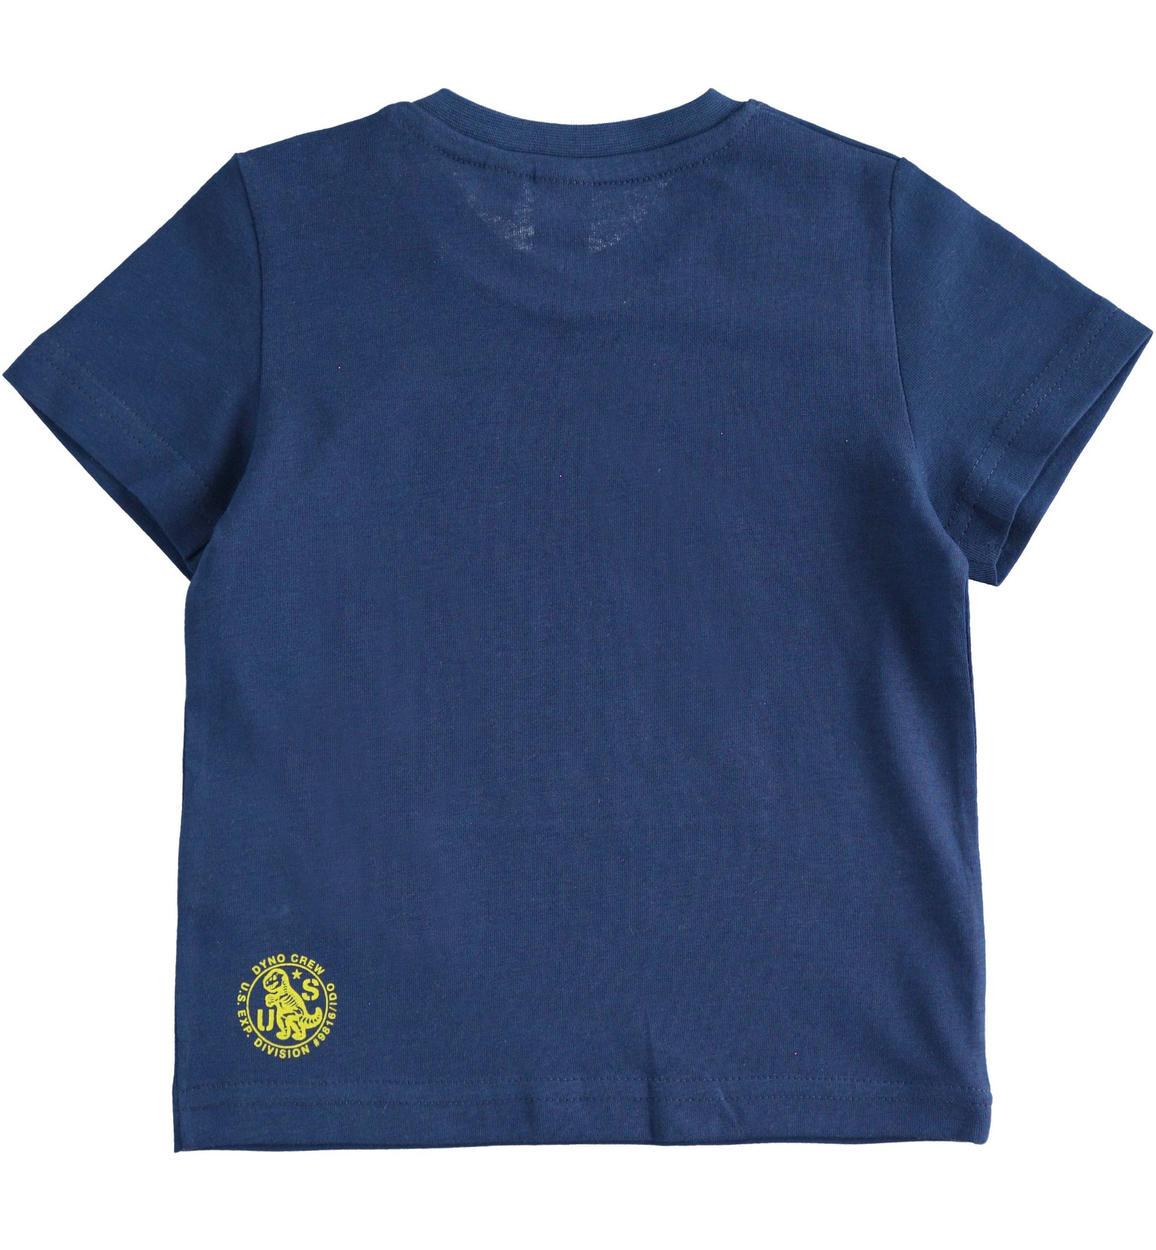 tshirt a manica corta 100 cotone con o navy retro 02 1214j68800 3547 150x150